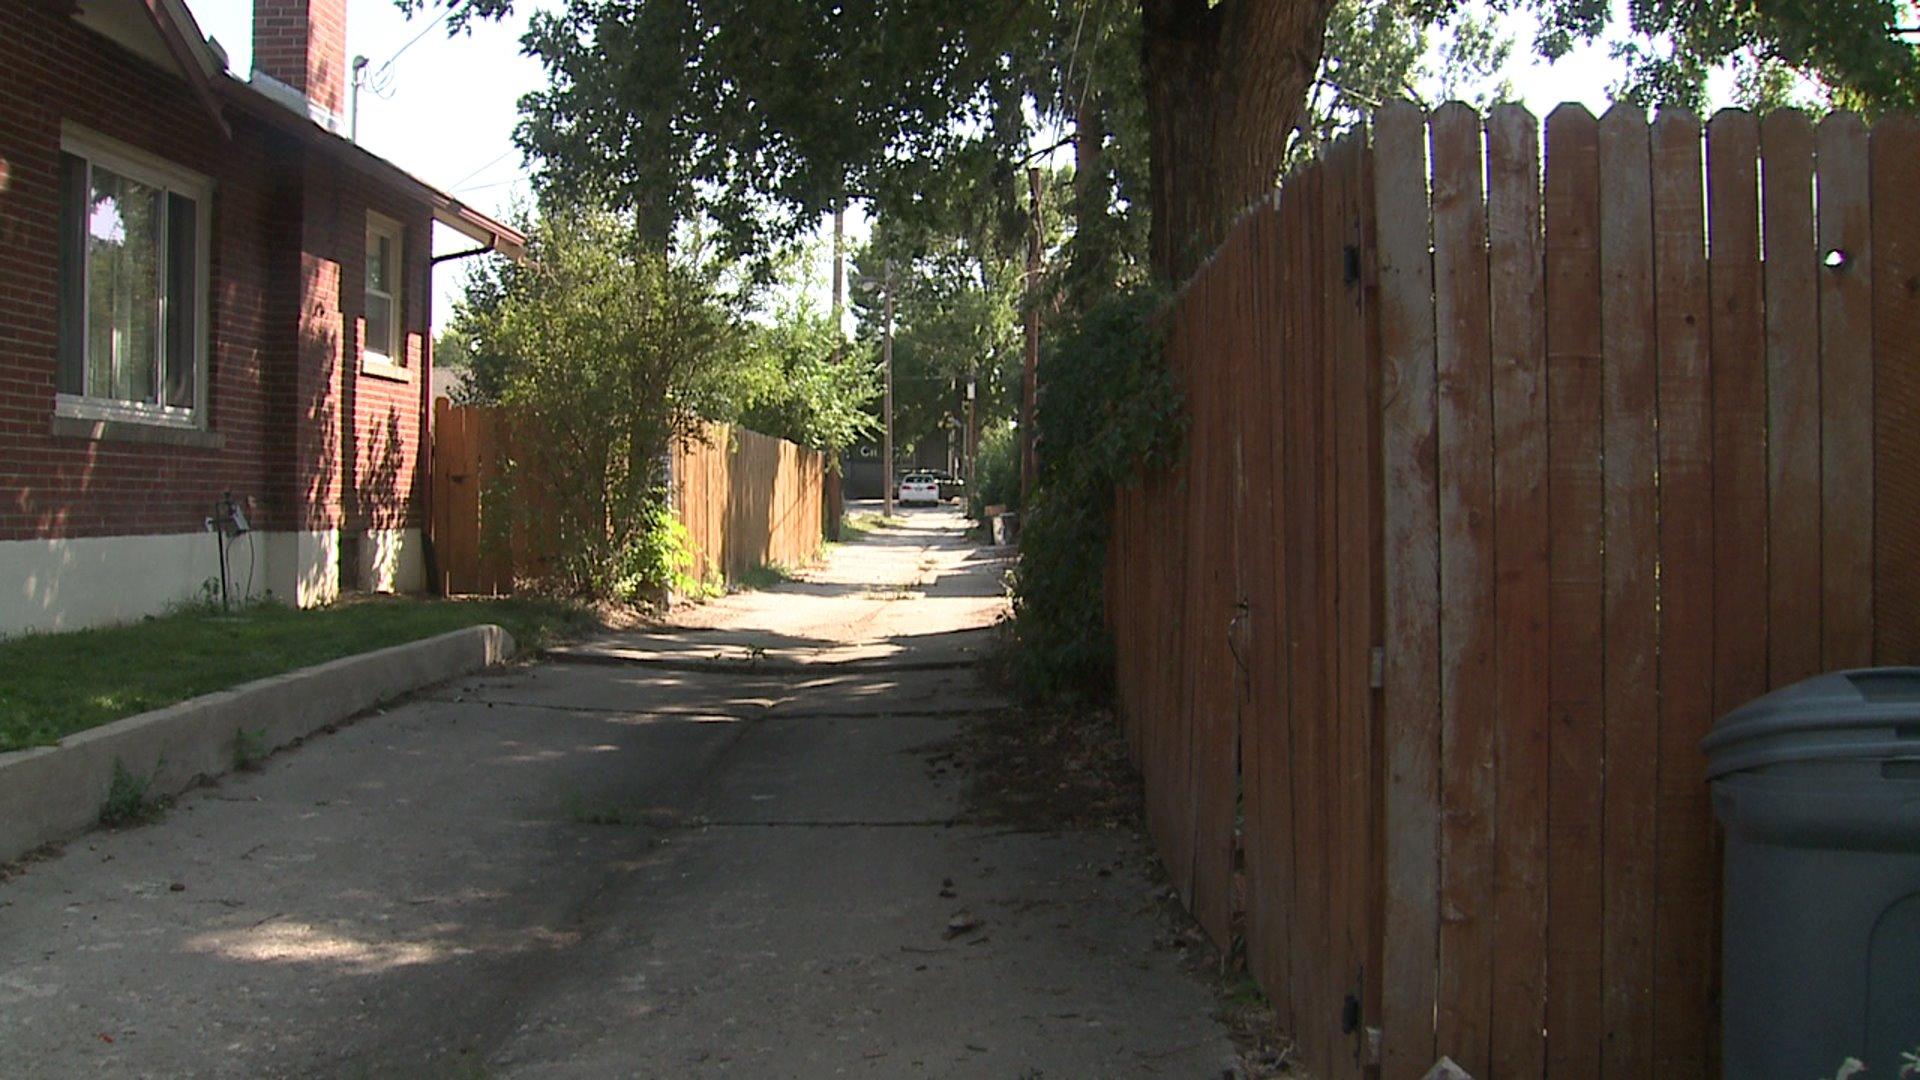 Alley in Denver's Park Hill neighborhood